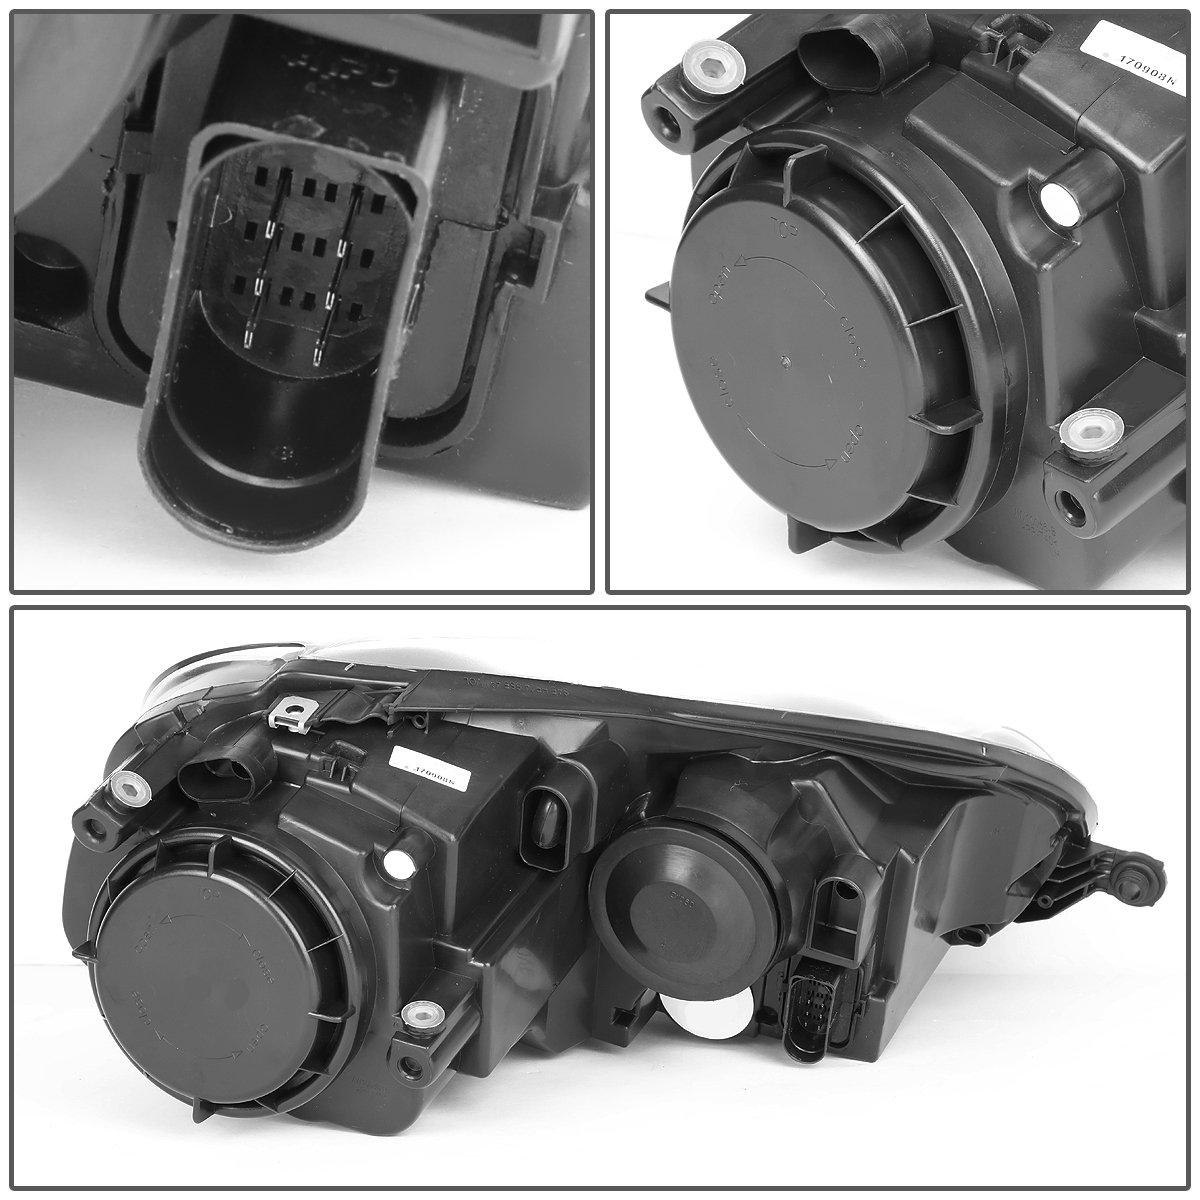 VW Golf / GTI / Jetta / Rabbit Pair of Headlight (Black Housing Clear Corner) by Auto Dynasty (Image #4)